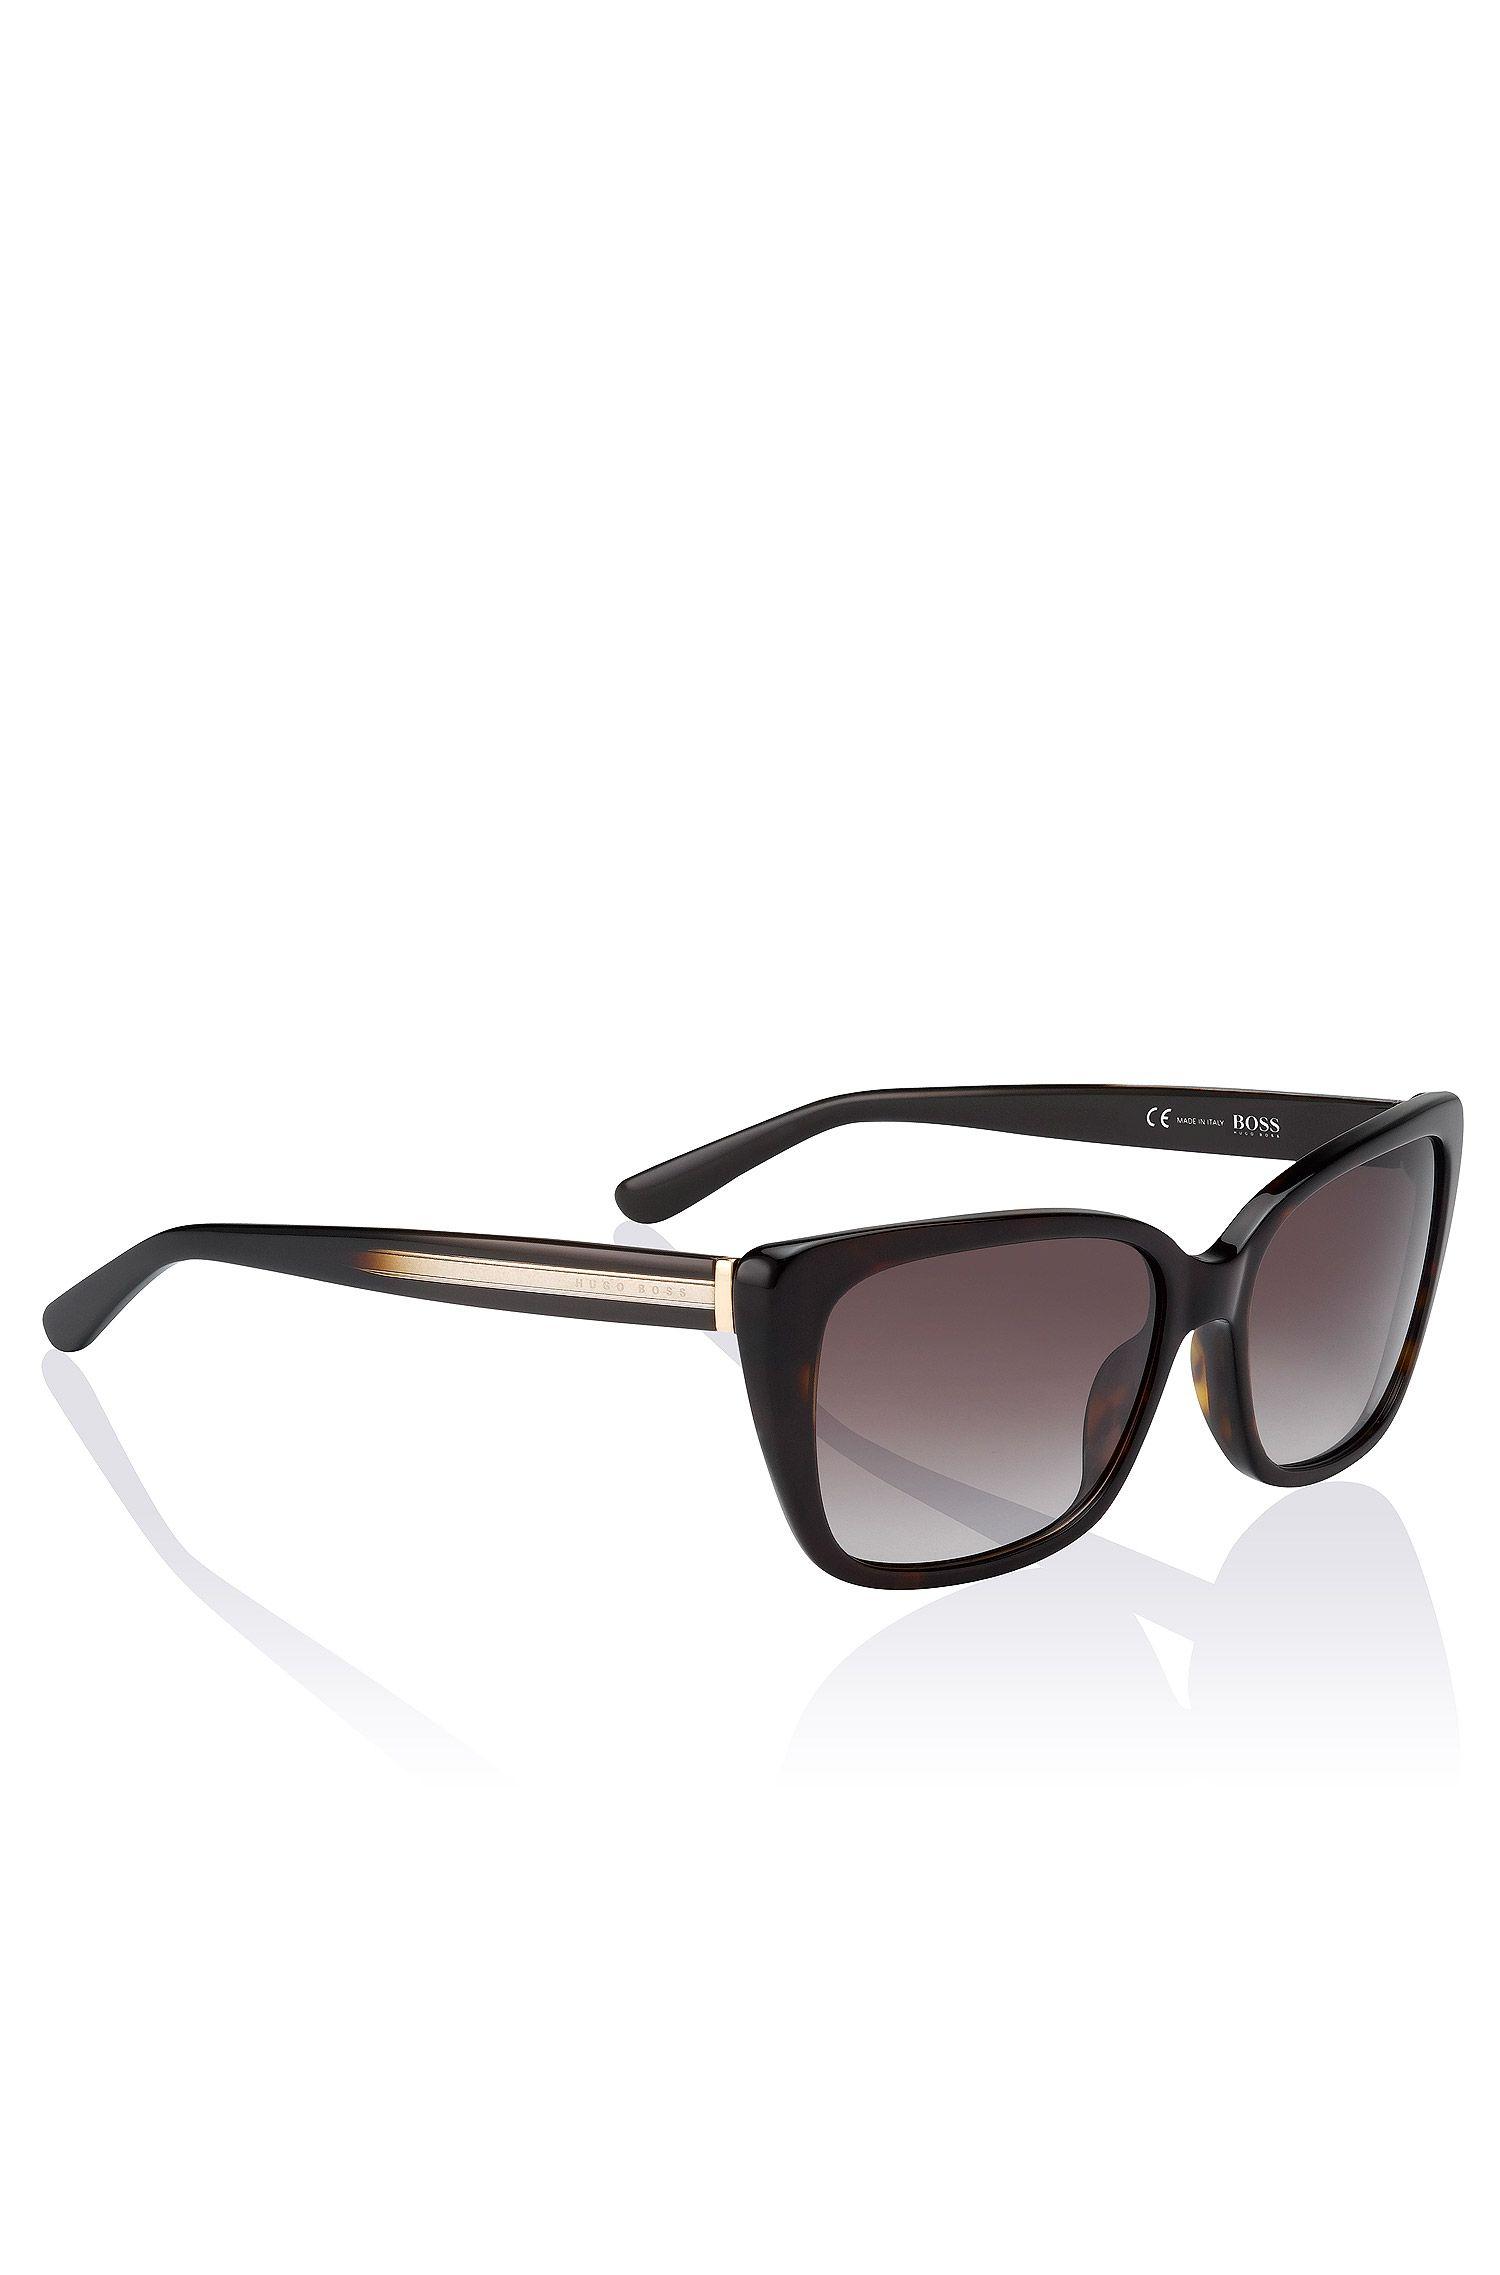 Sonnenbrille ´BOSS 0612/S`